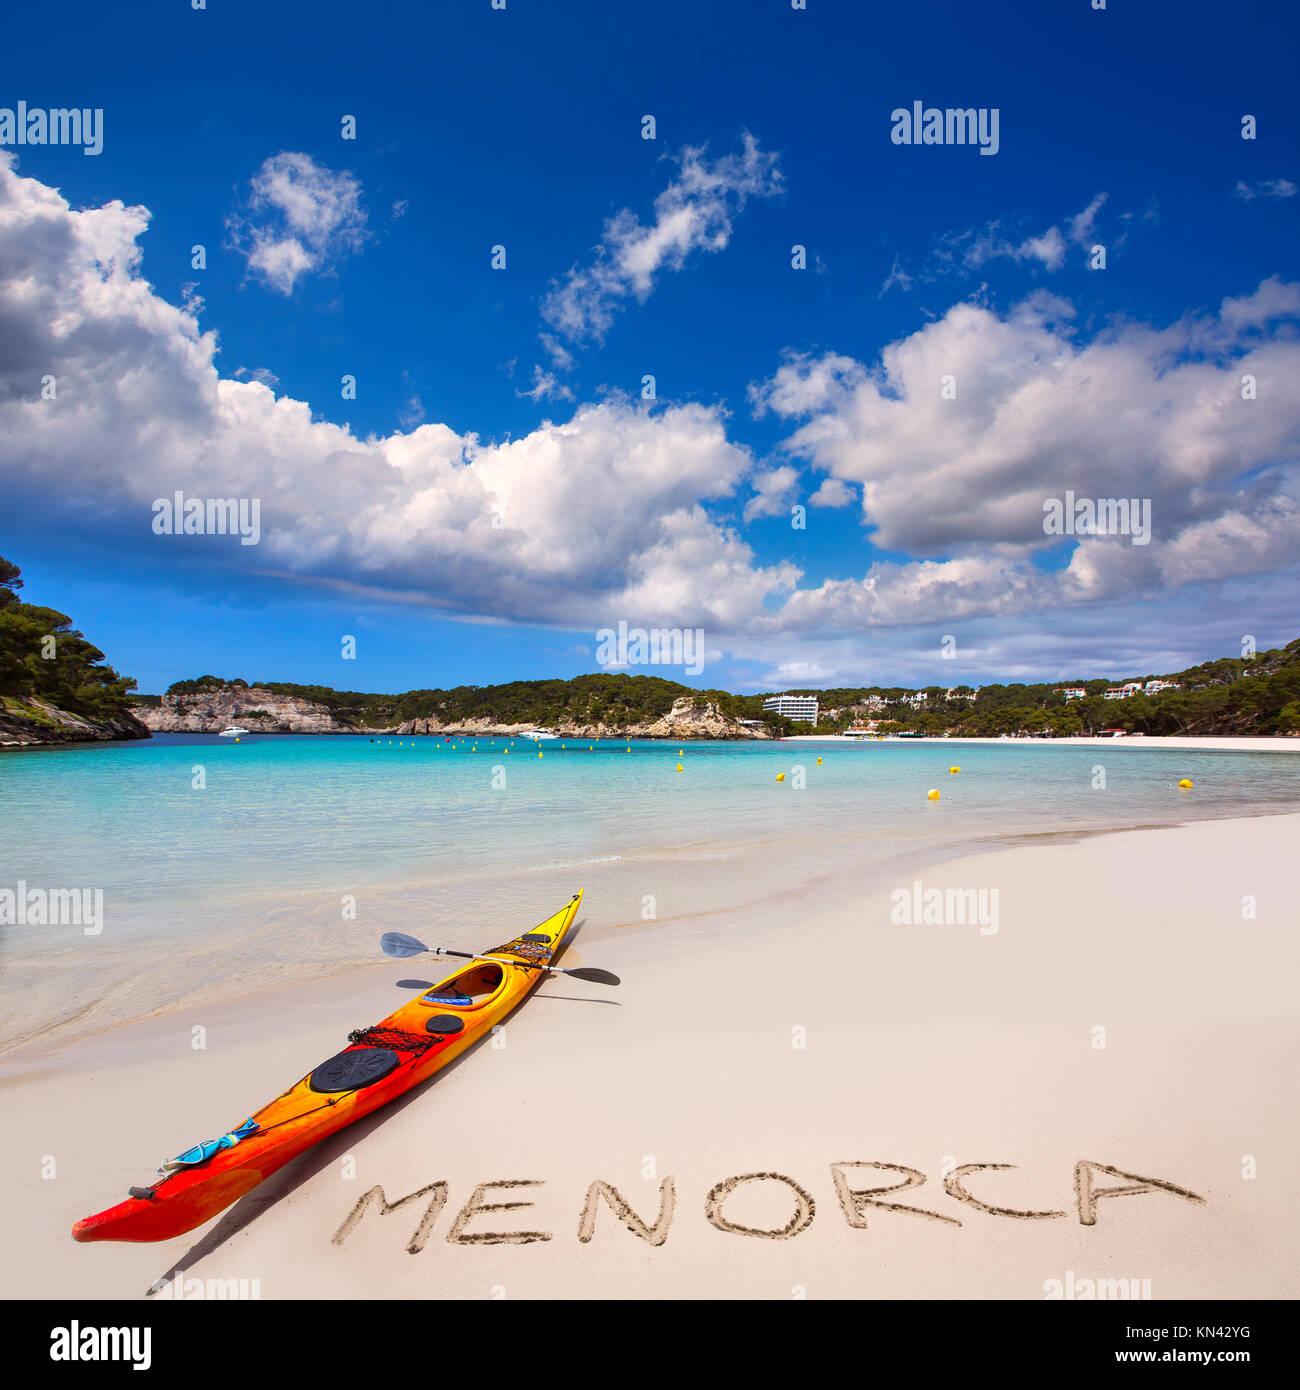 Menorca Cala Galdana Beach in Ciutadella at Balearic islands. - Stock Image